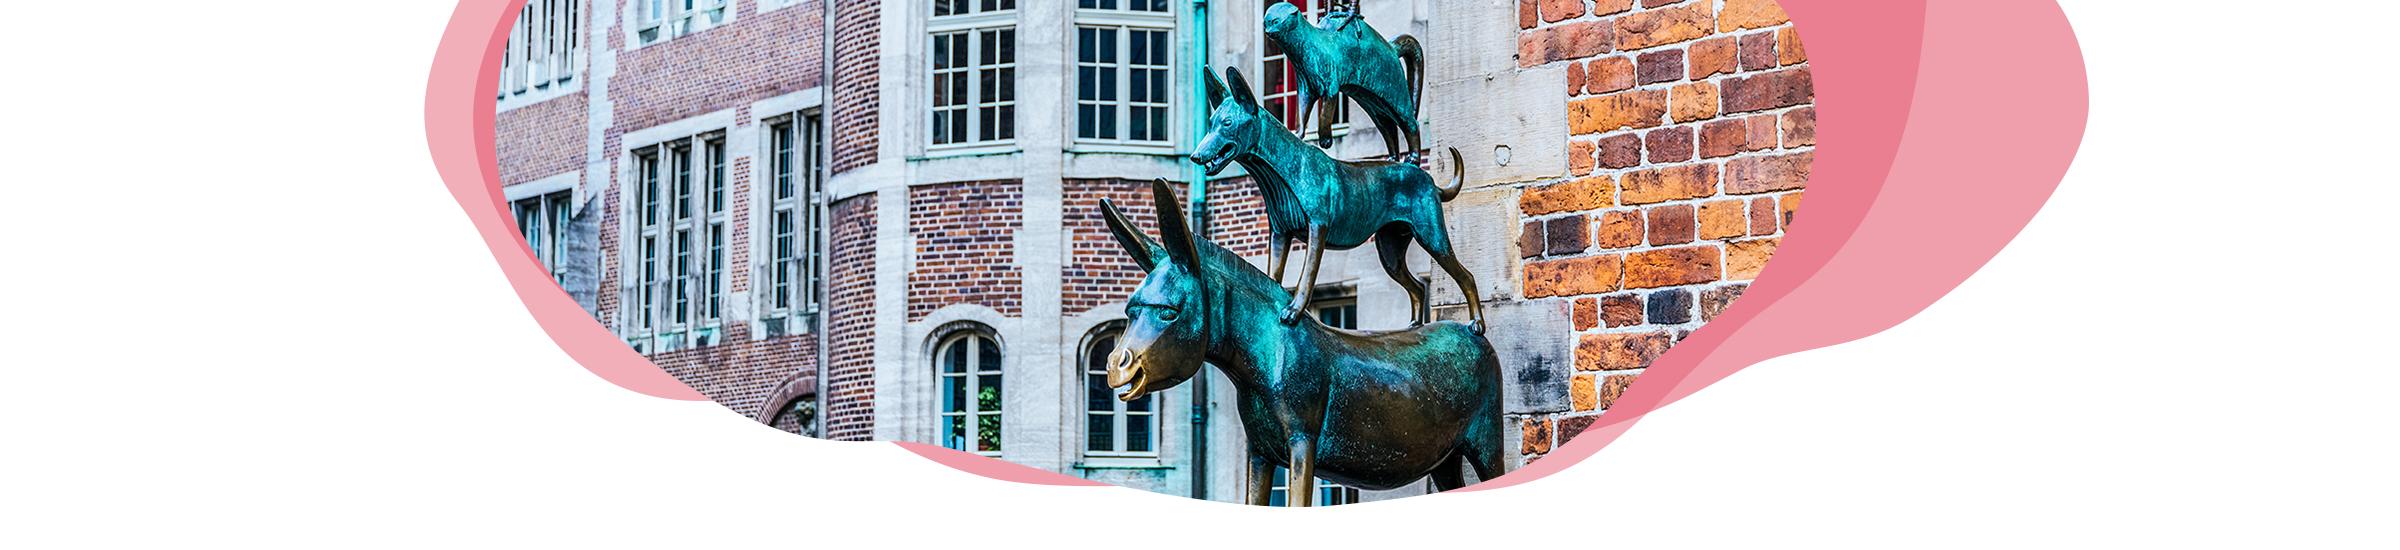 Digitale Reise Bremen Header